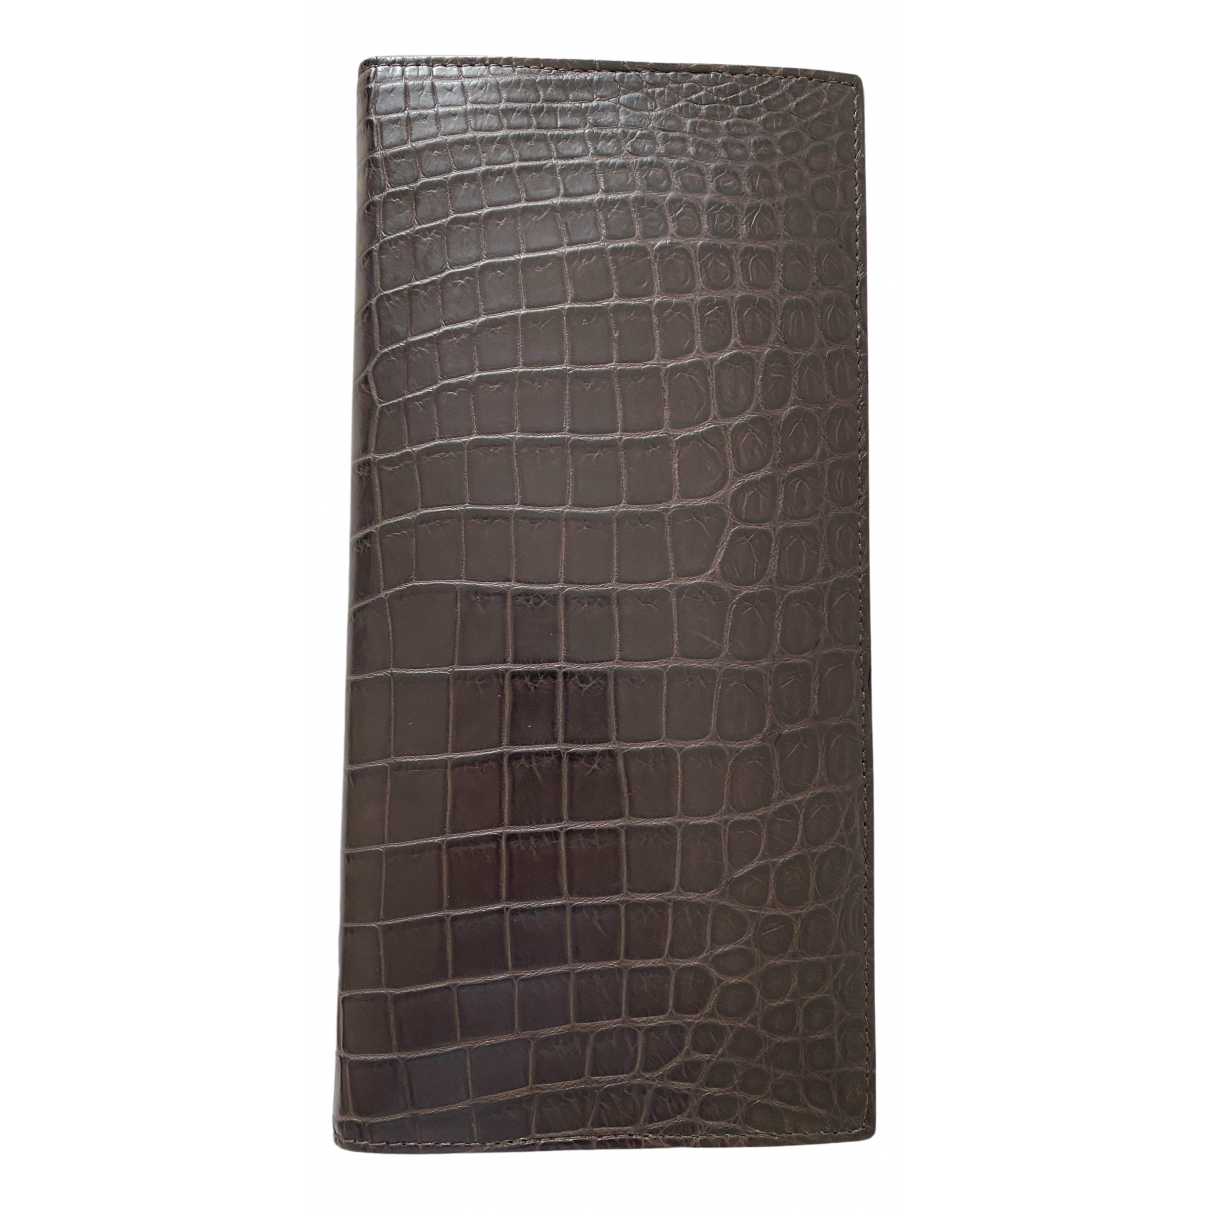 Bottega Veneta - Portefeuille   pour femme en crocodile - marron